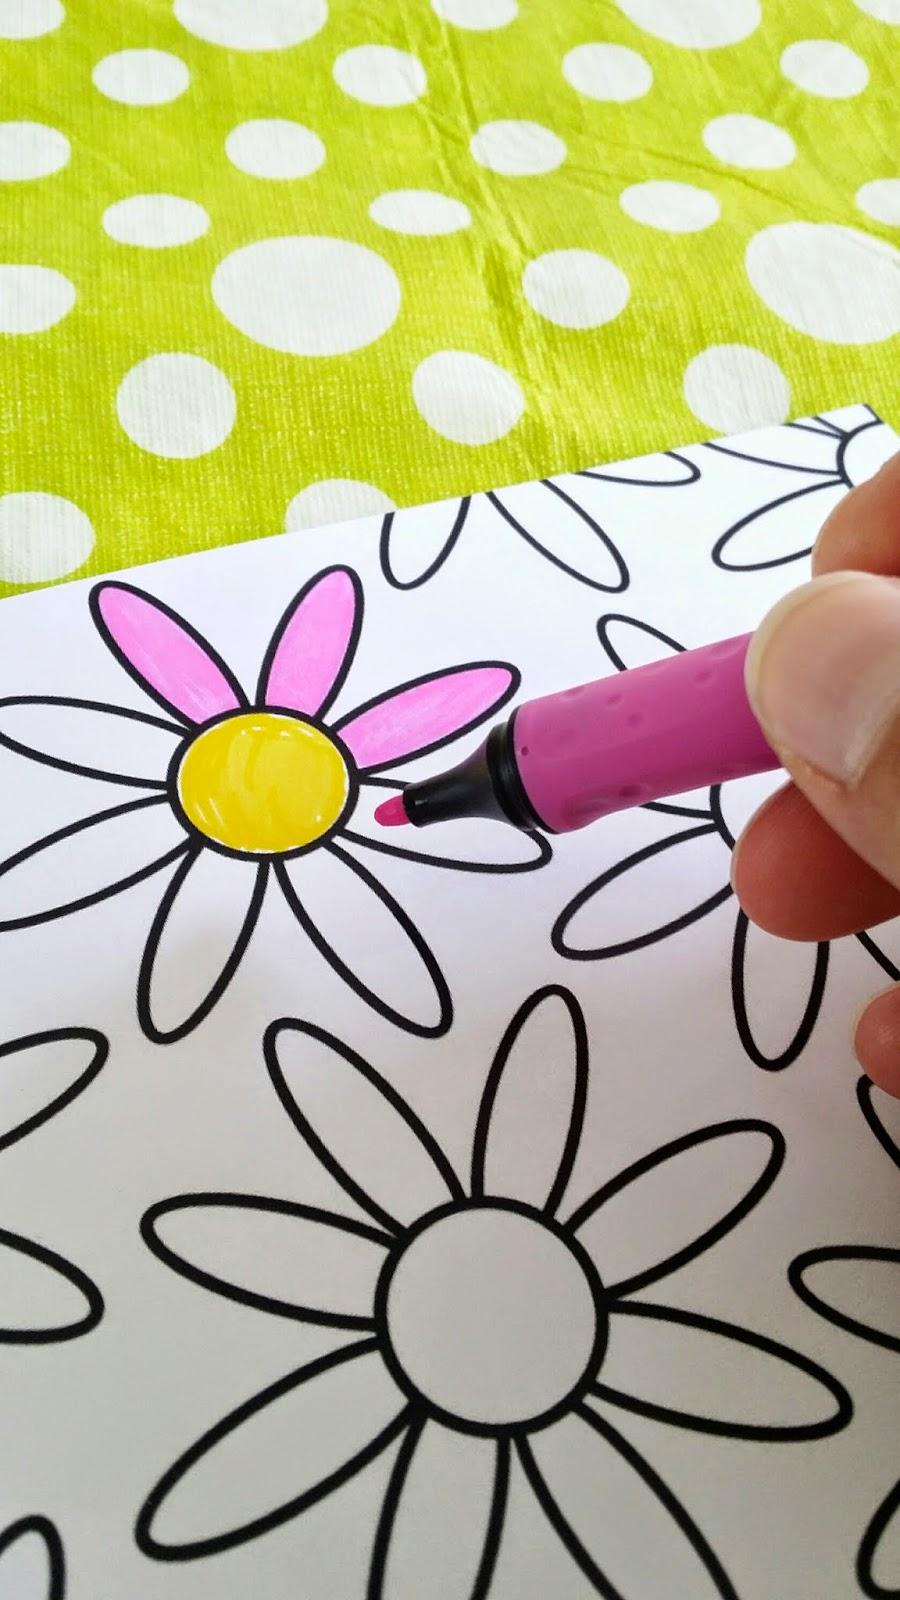 http://www.jaliencozyliving.nl/c-2557204/kleurboek/